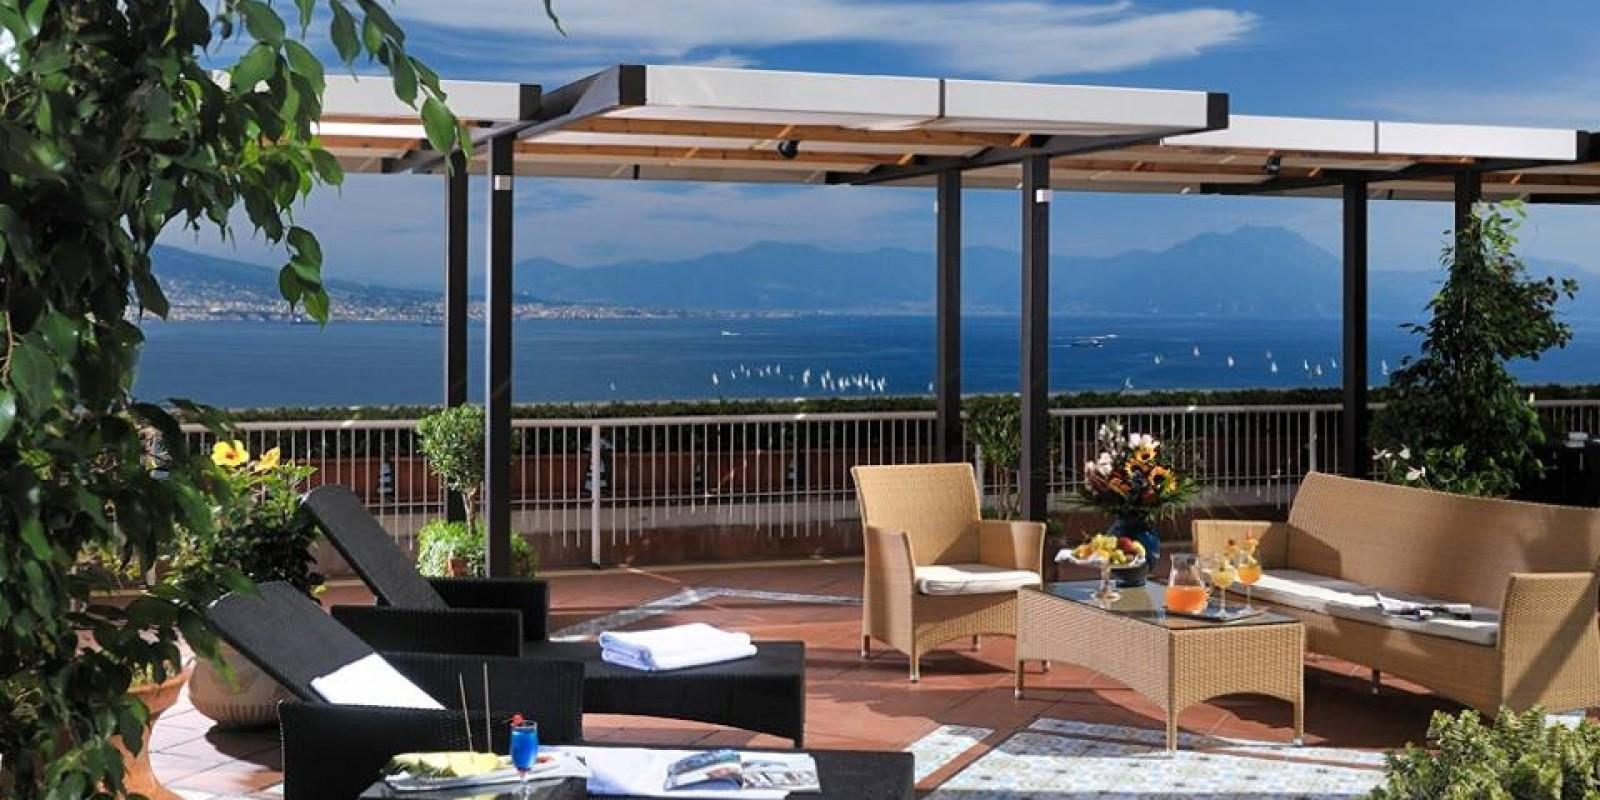 Emejing La Terrazza Napoli Photos - Design Trends 2017 - shopmakers.us